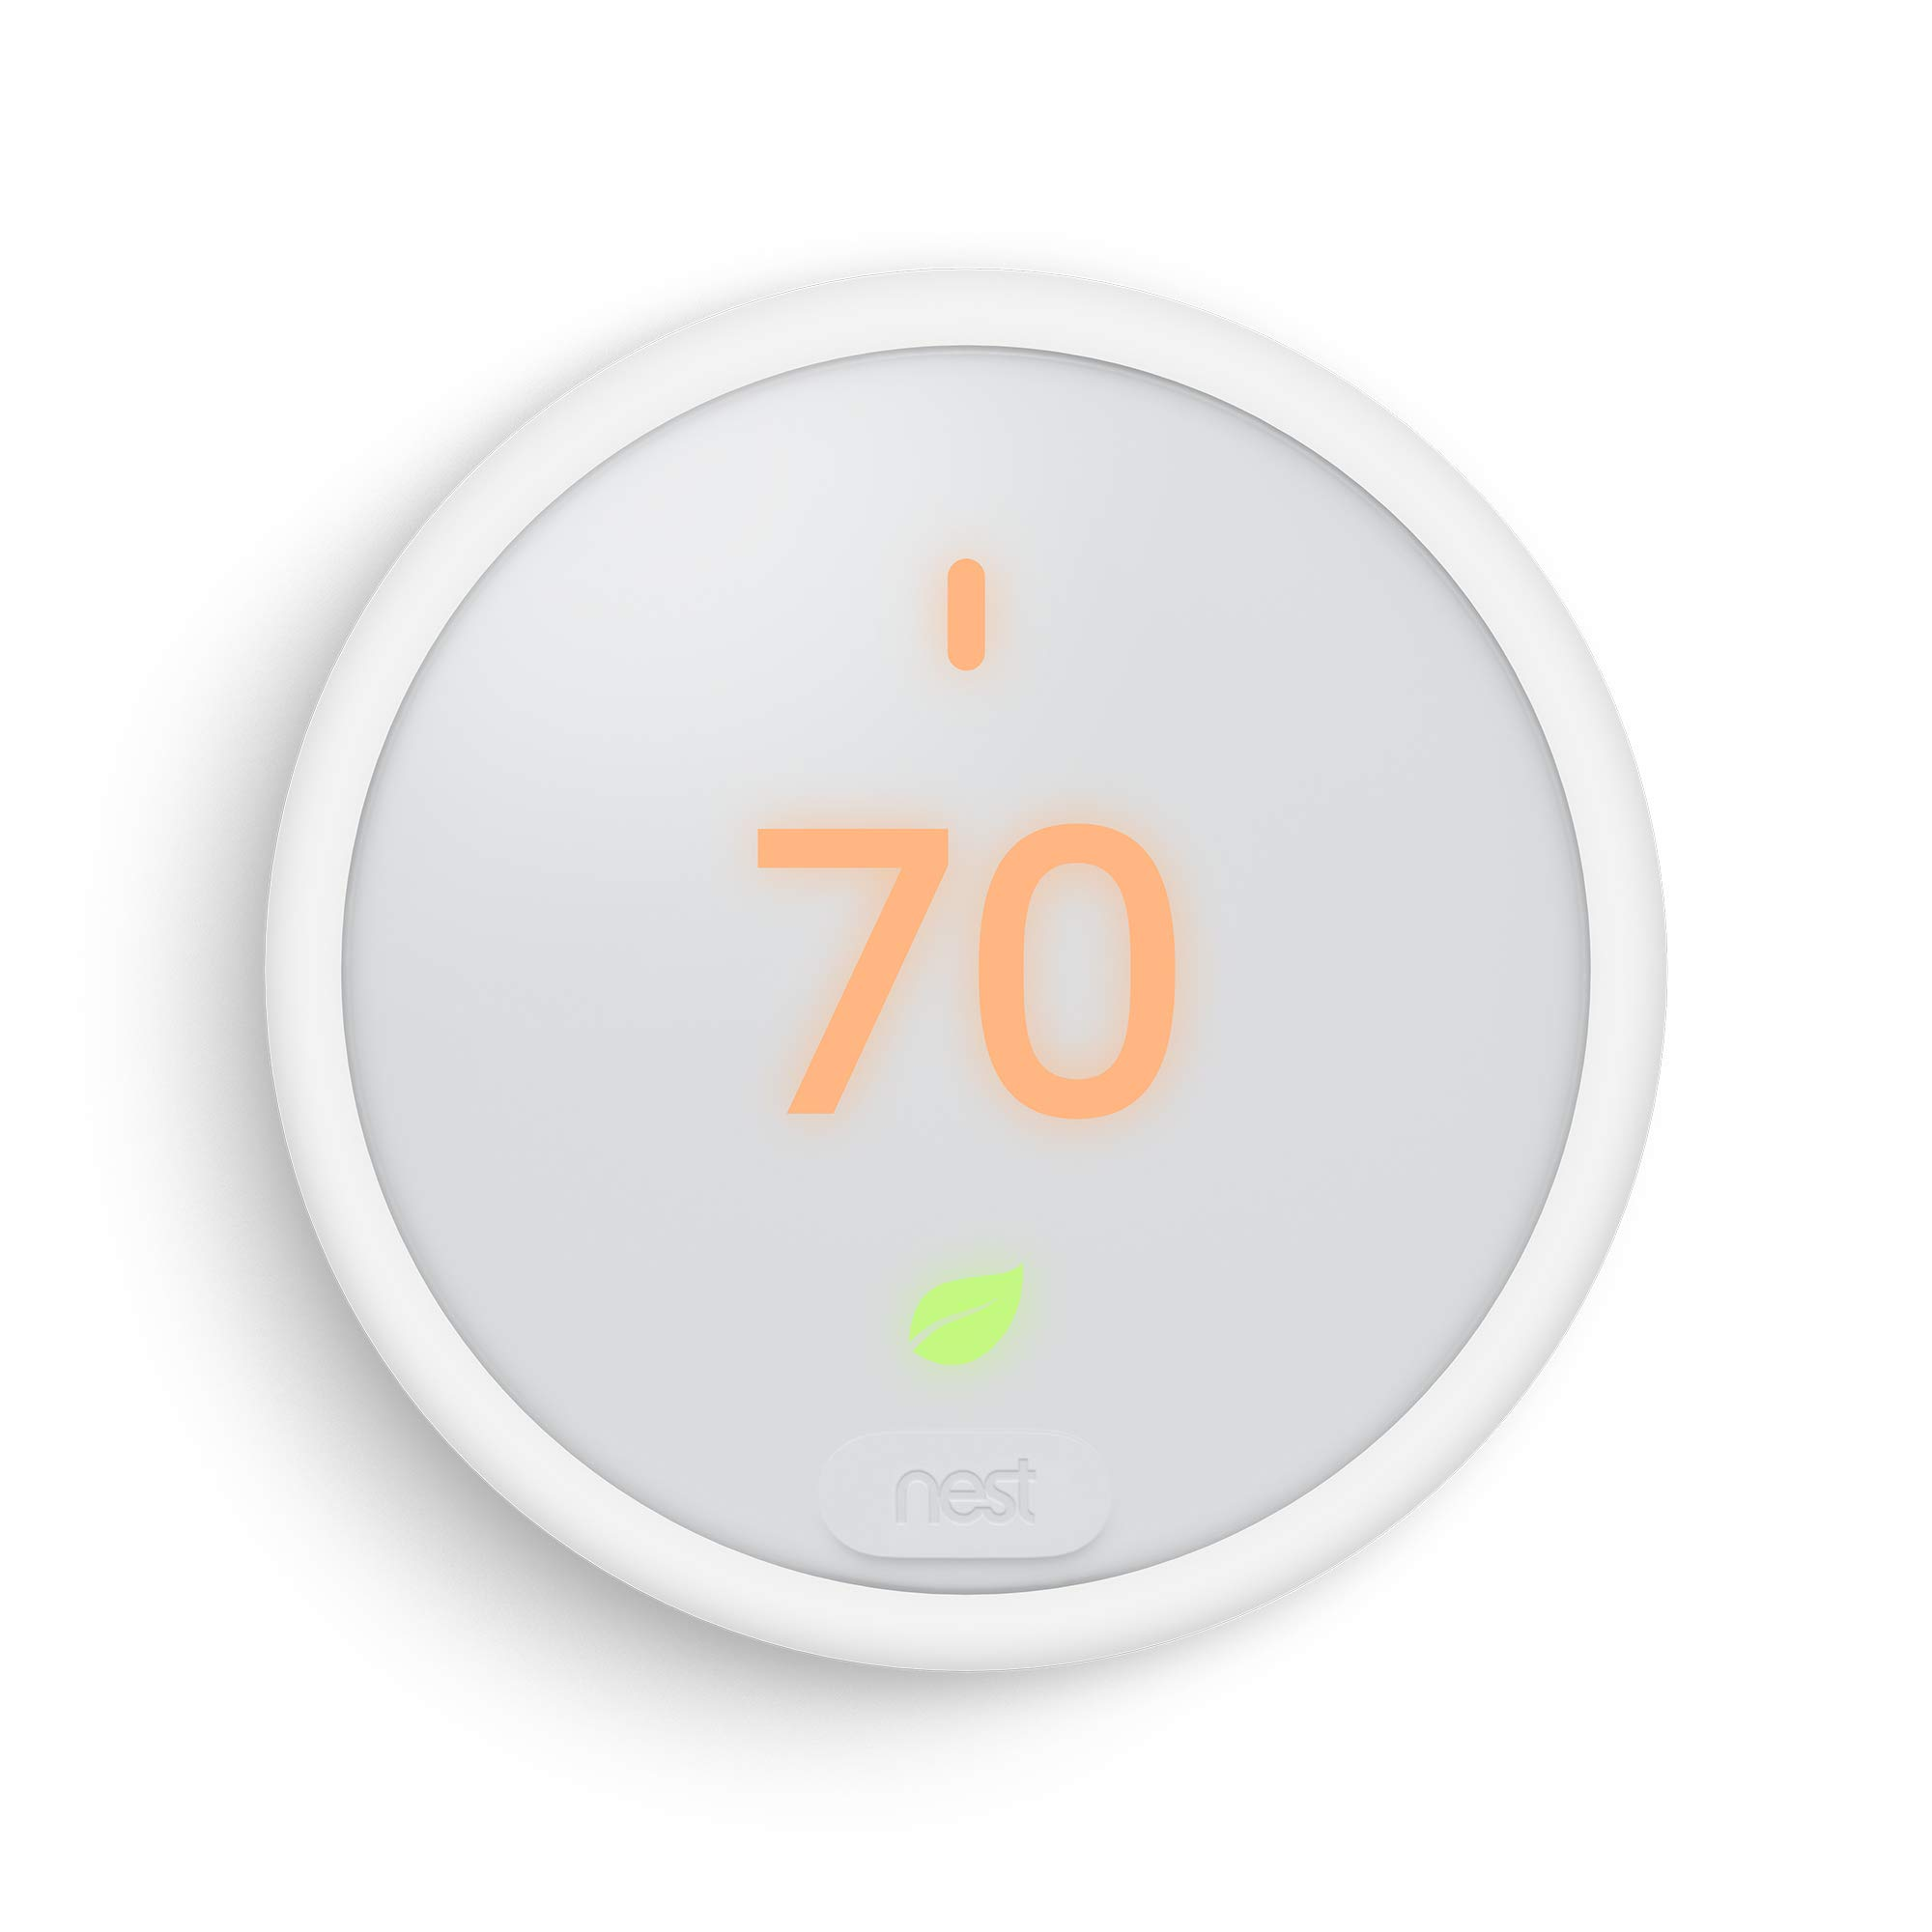 Google, T4000ES, Nest Thermostat E, Smart Thermostat, White by Google